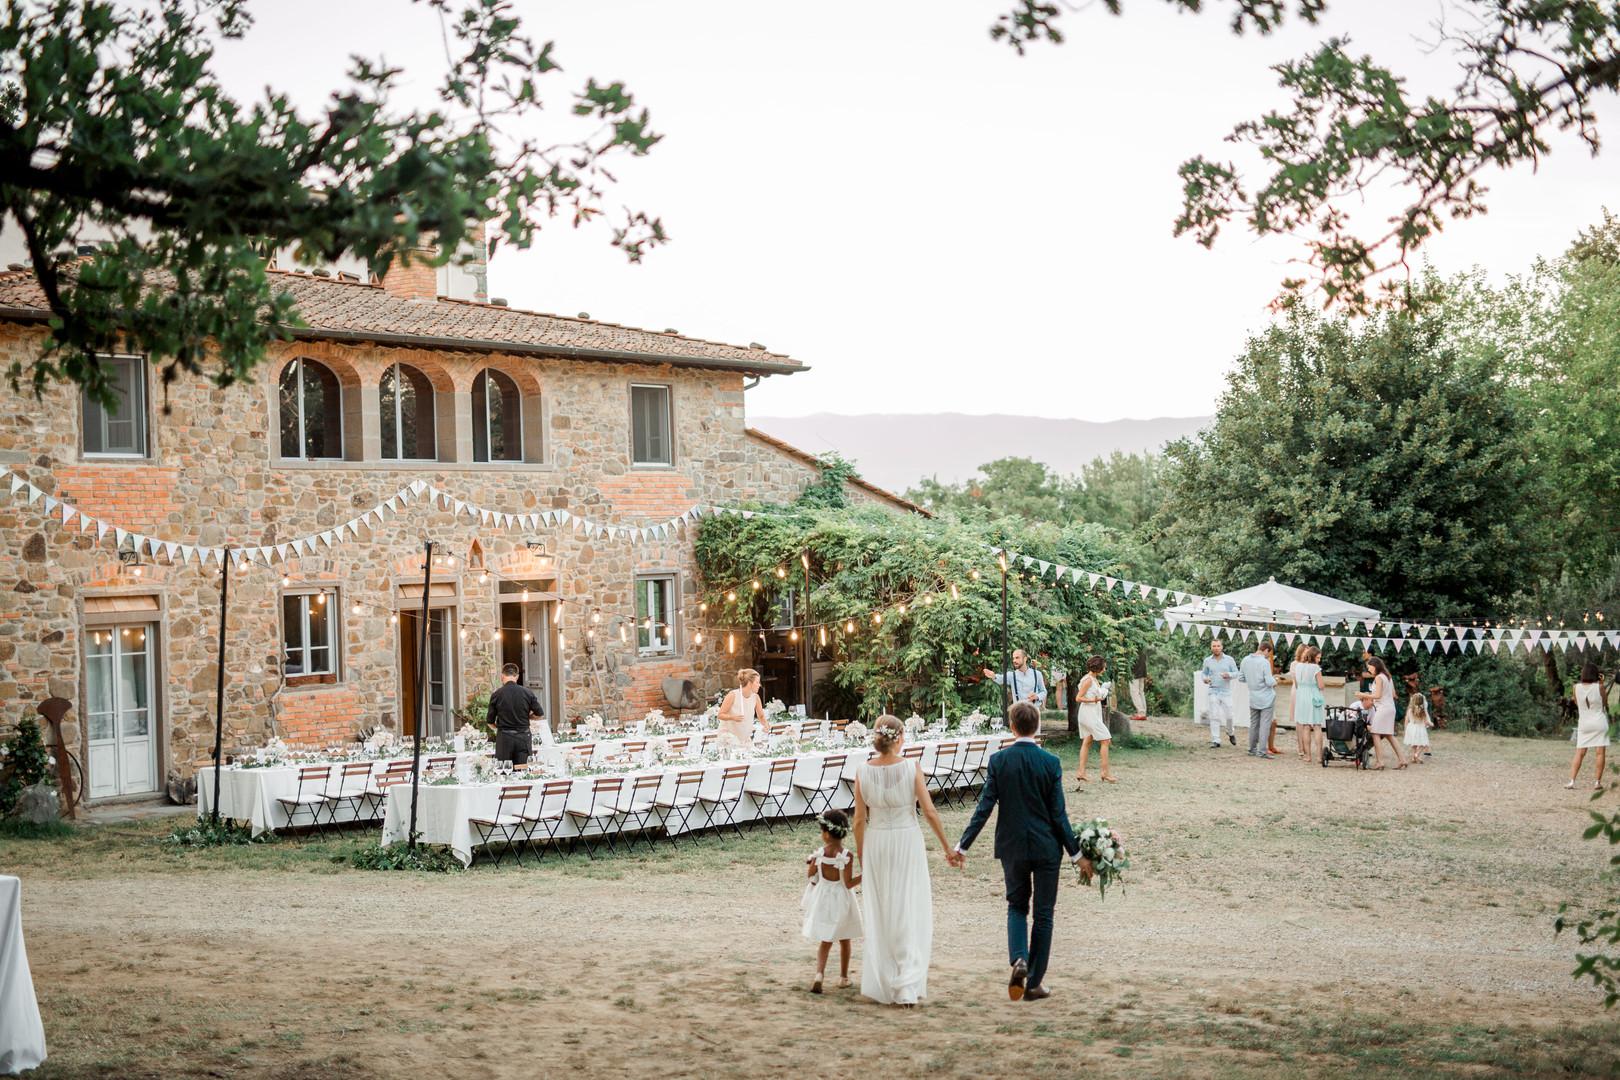 Fanny_Antoine_LaSelva_wedding-588.jpg